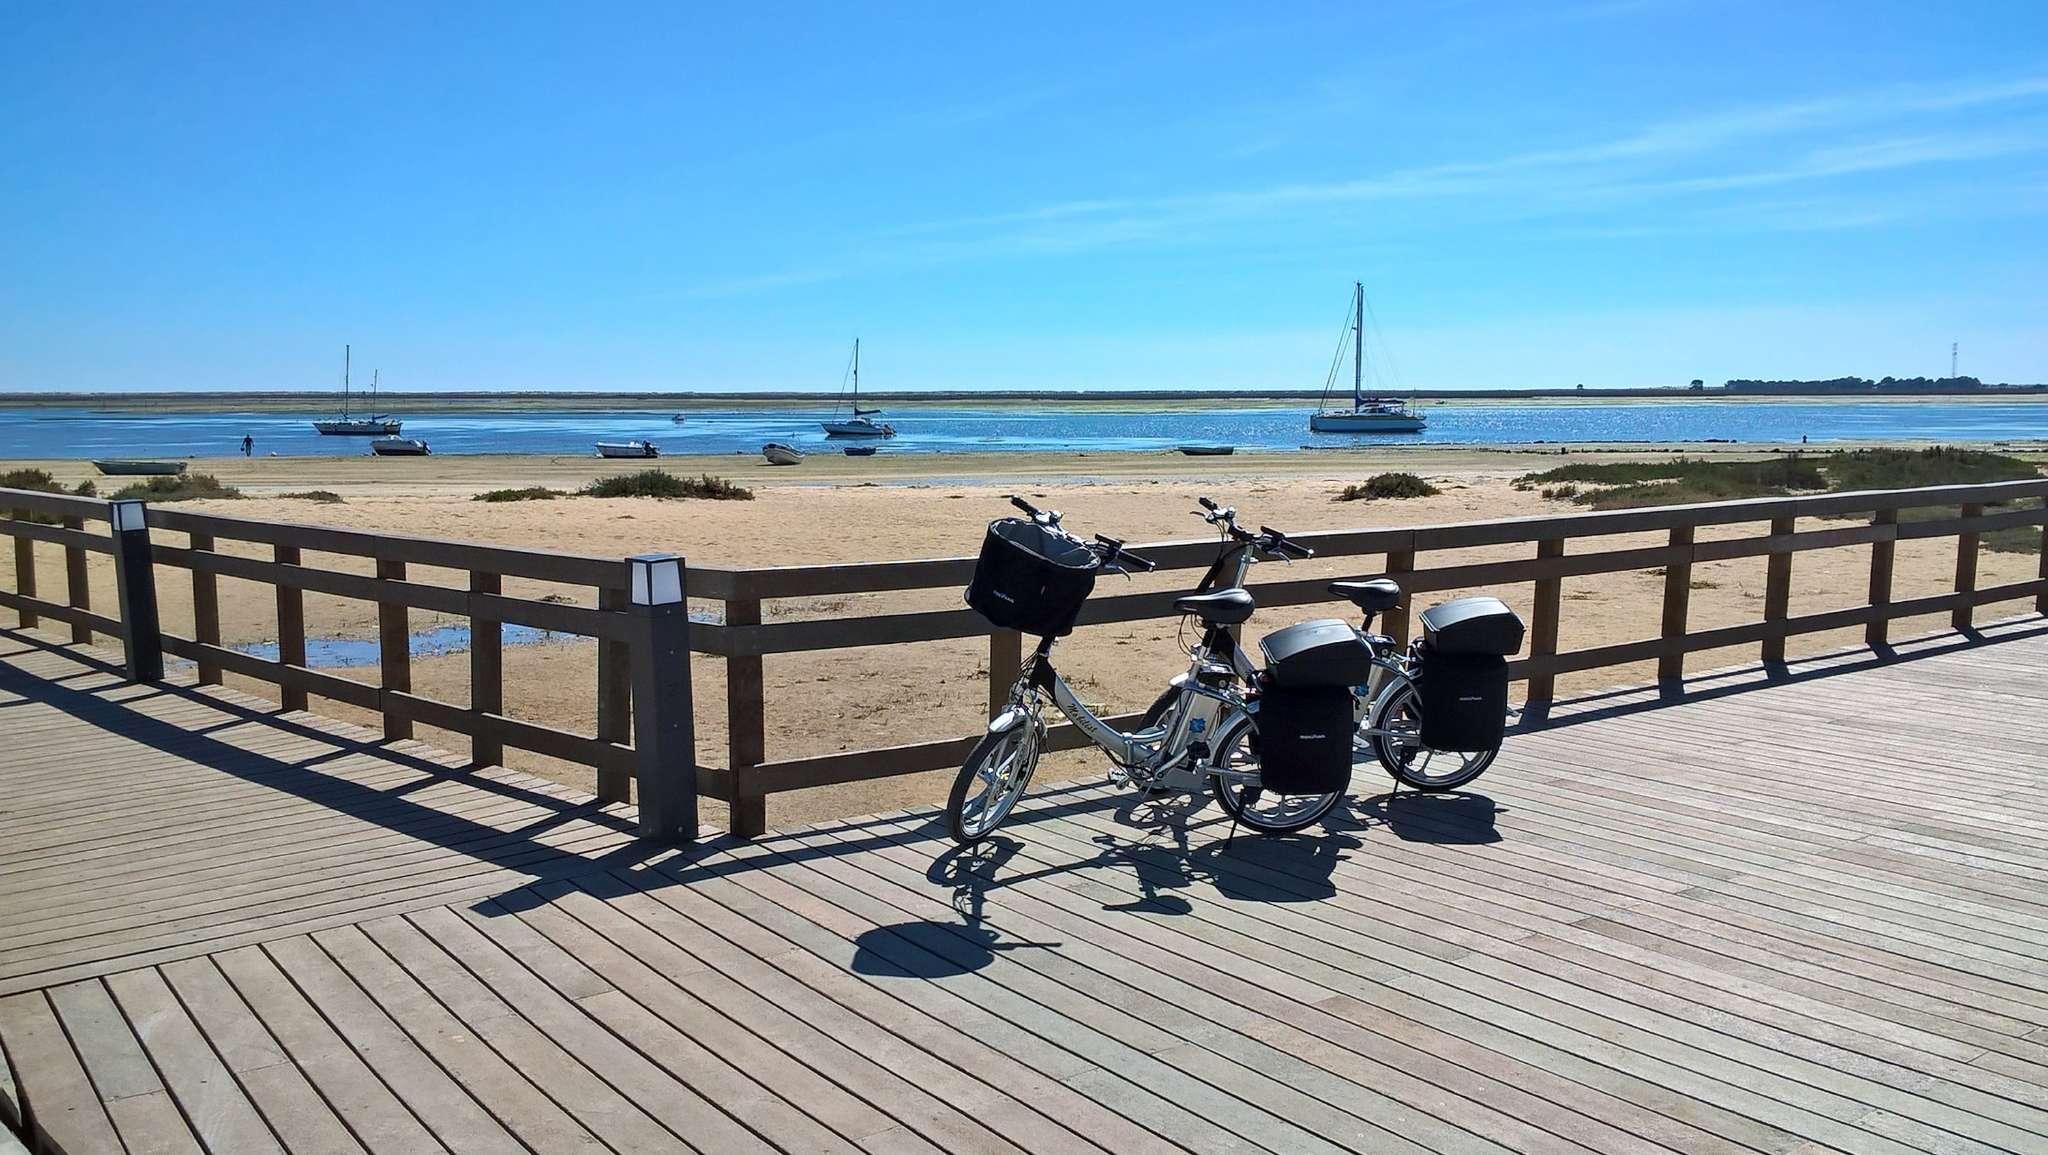 Praia Dos Cavacos 5 min. mit den E-bikes